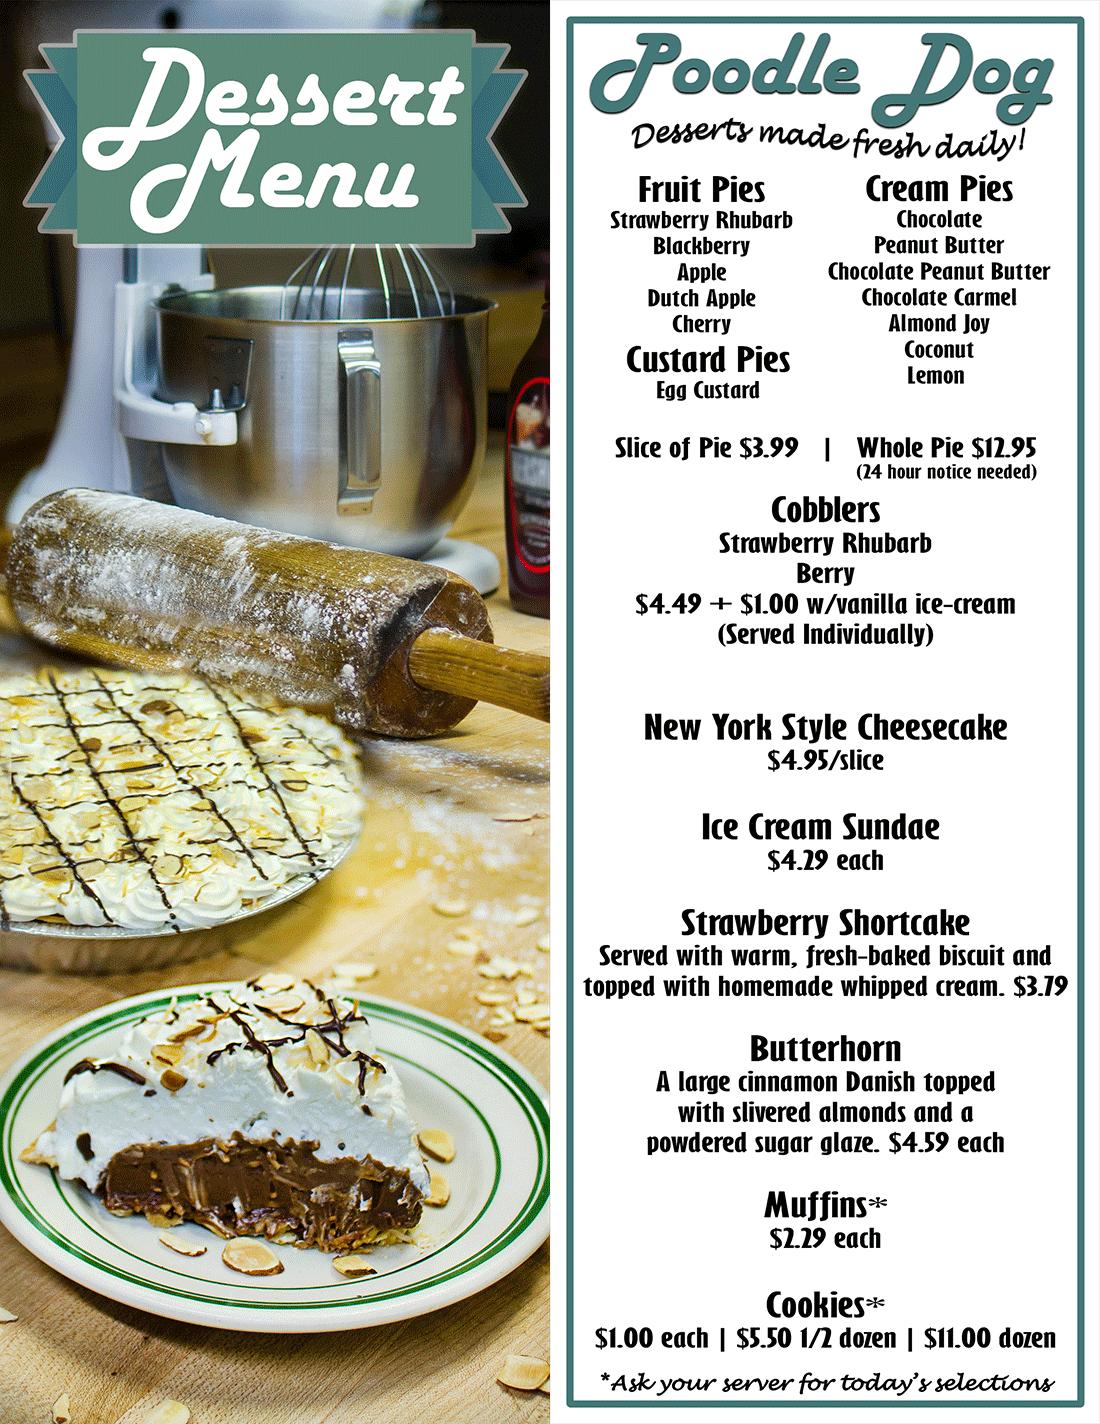 Dessert Menu - The Poo...